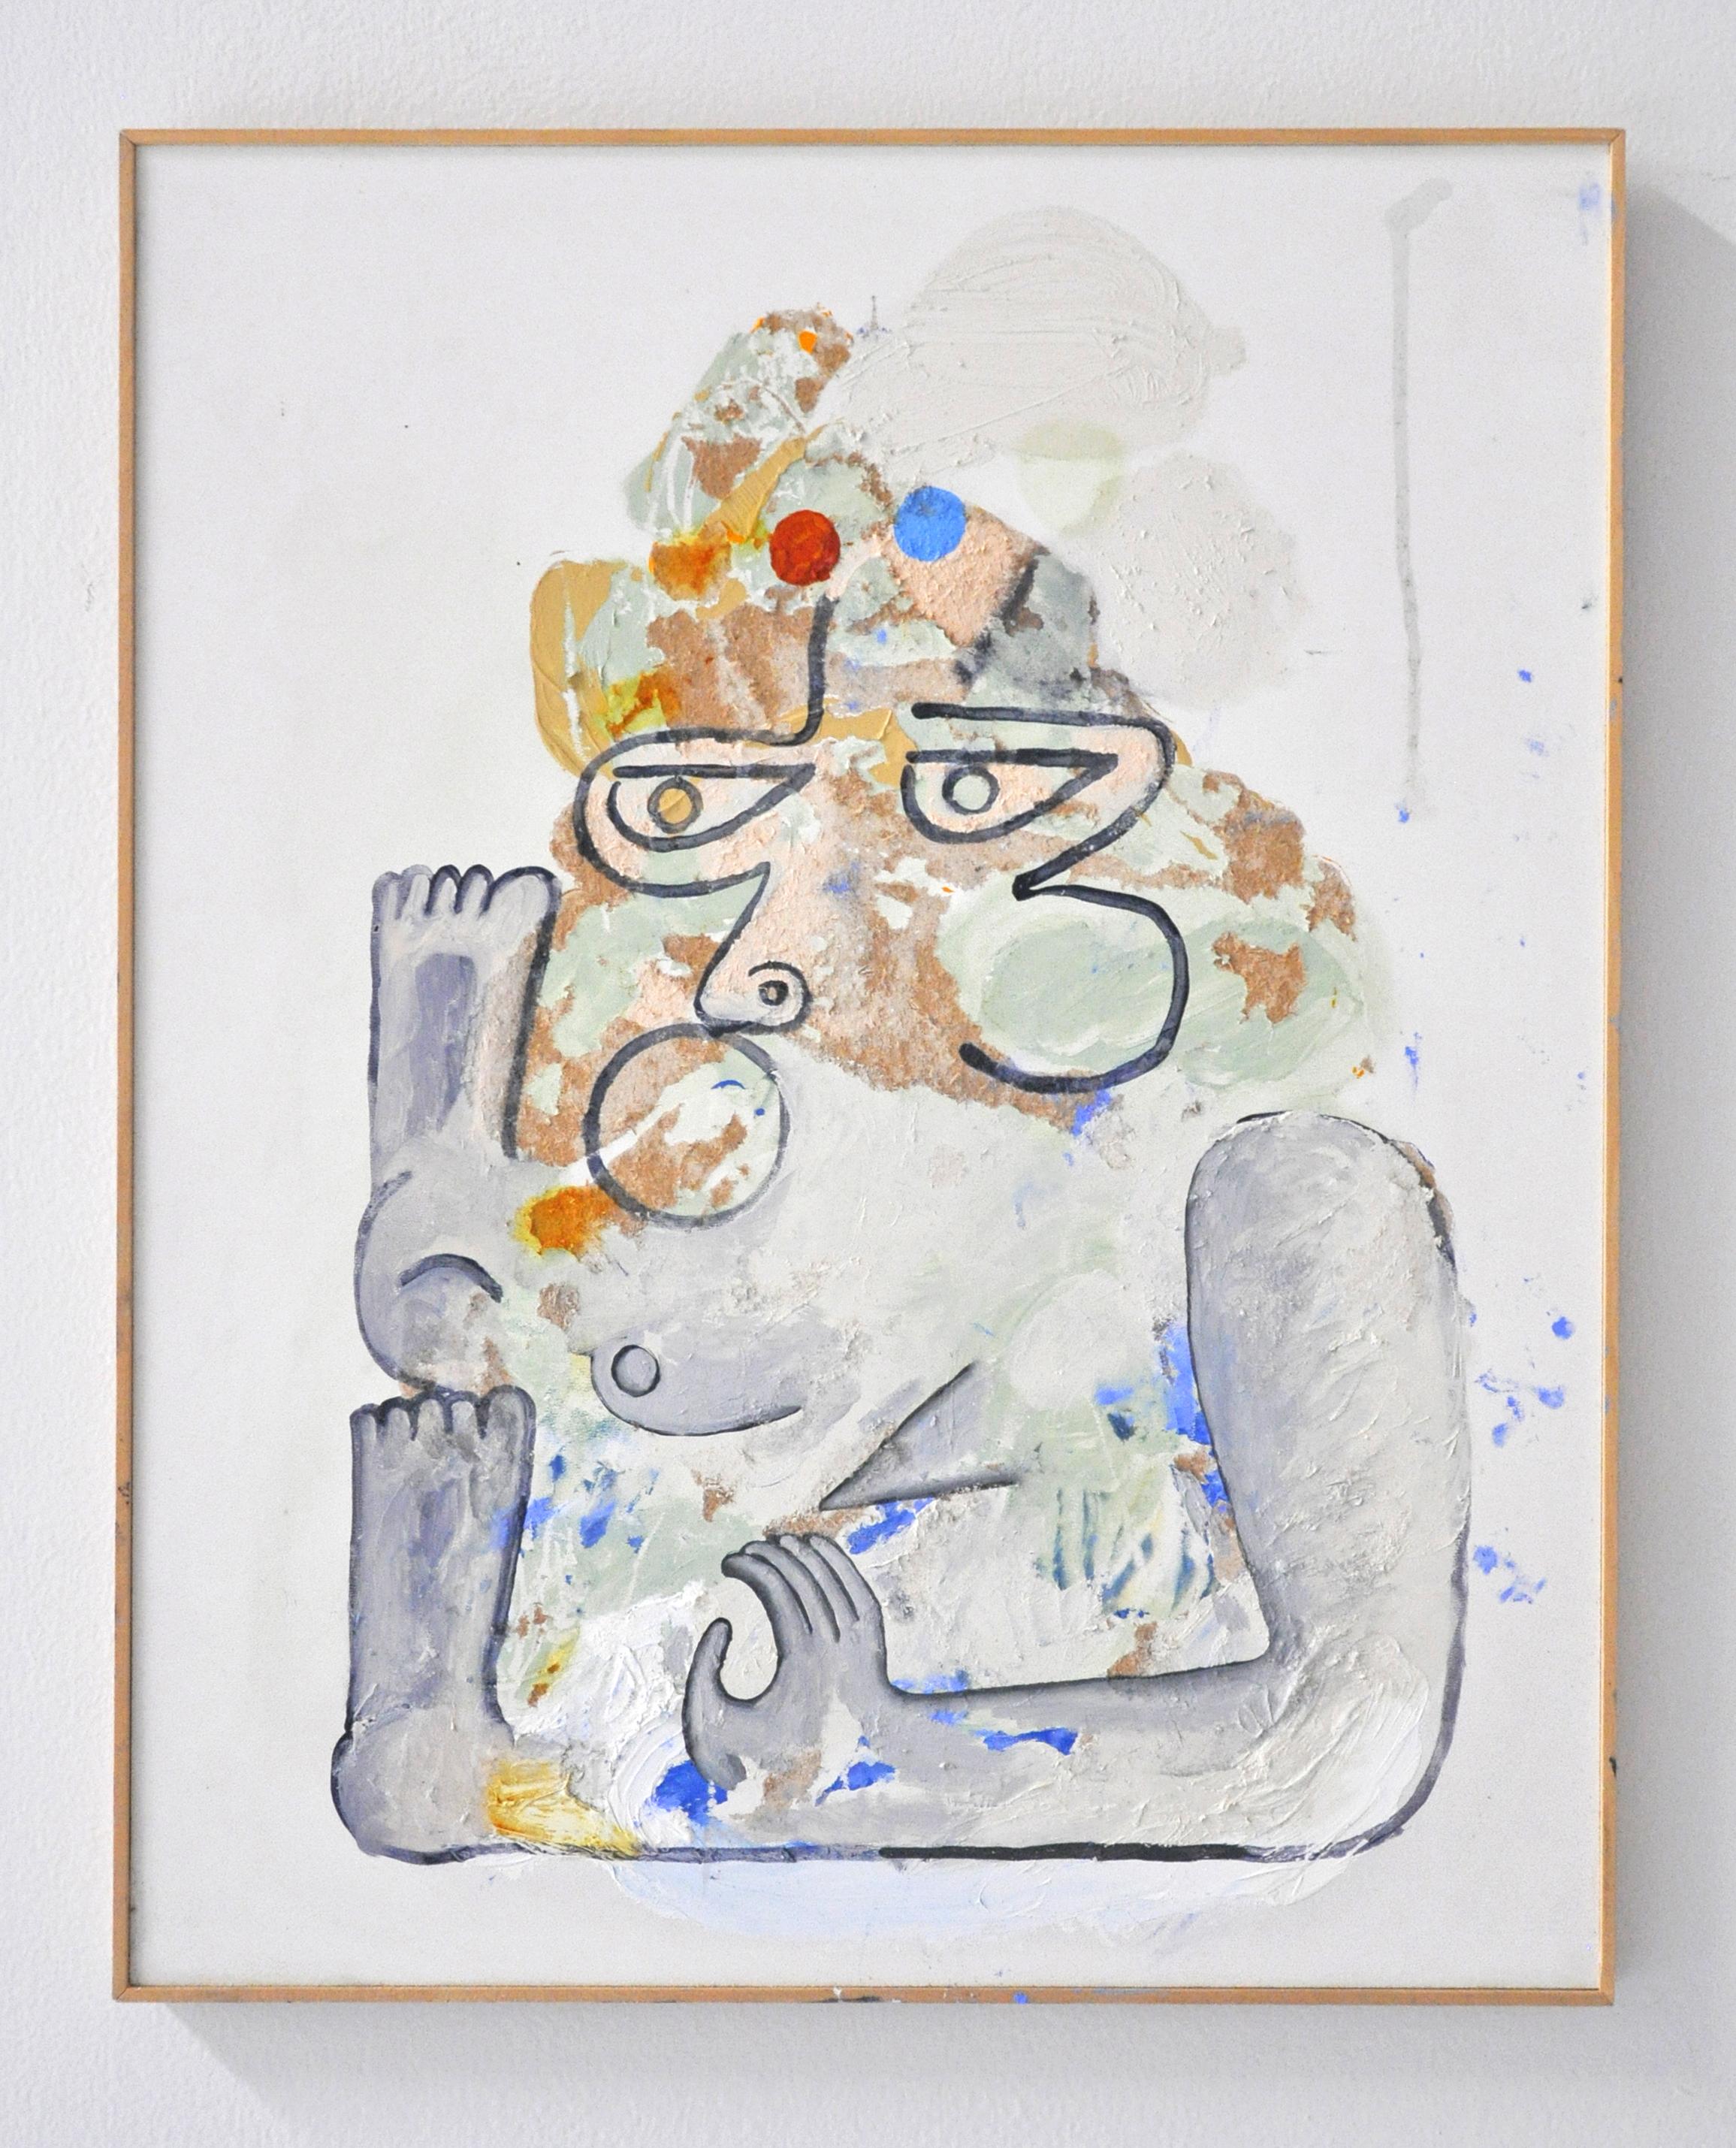 DEVANDRA BANHART PLEASURE OF NO MAN, Acrylic on paper, 16 x 20 in, 2019 $3000